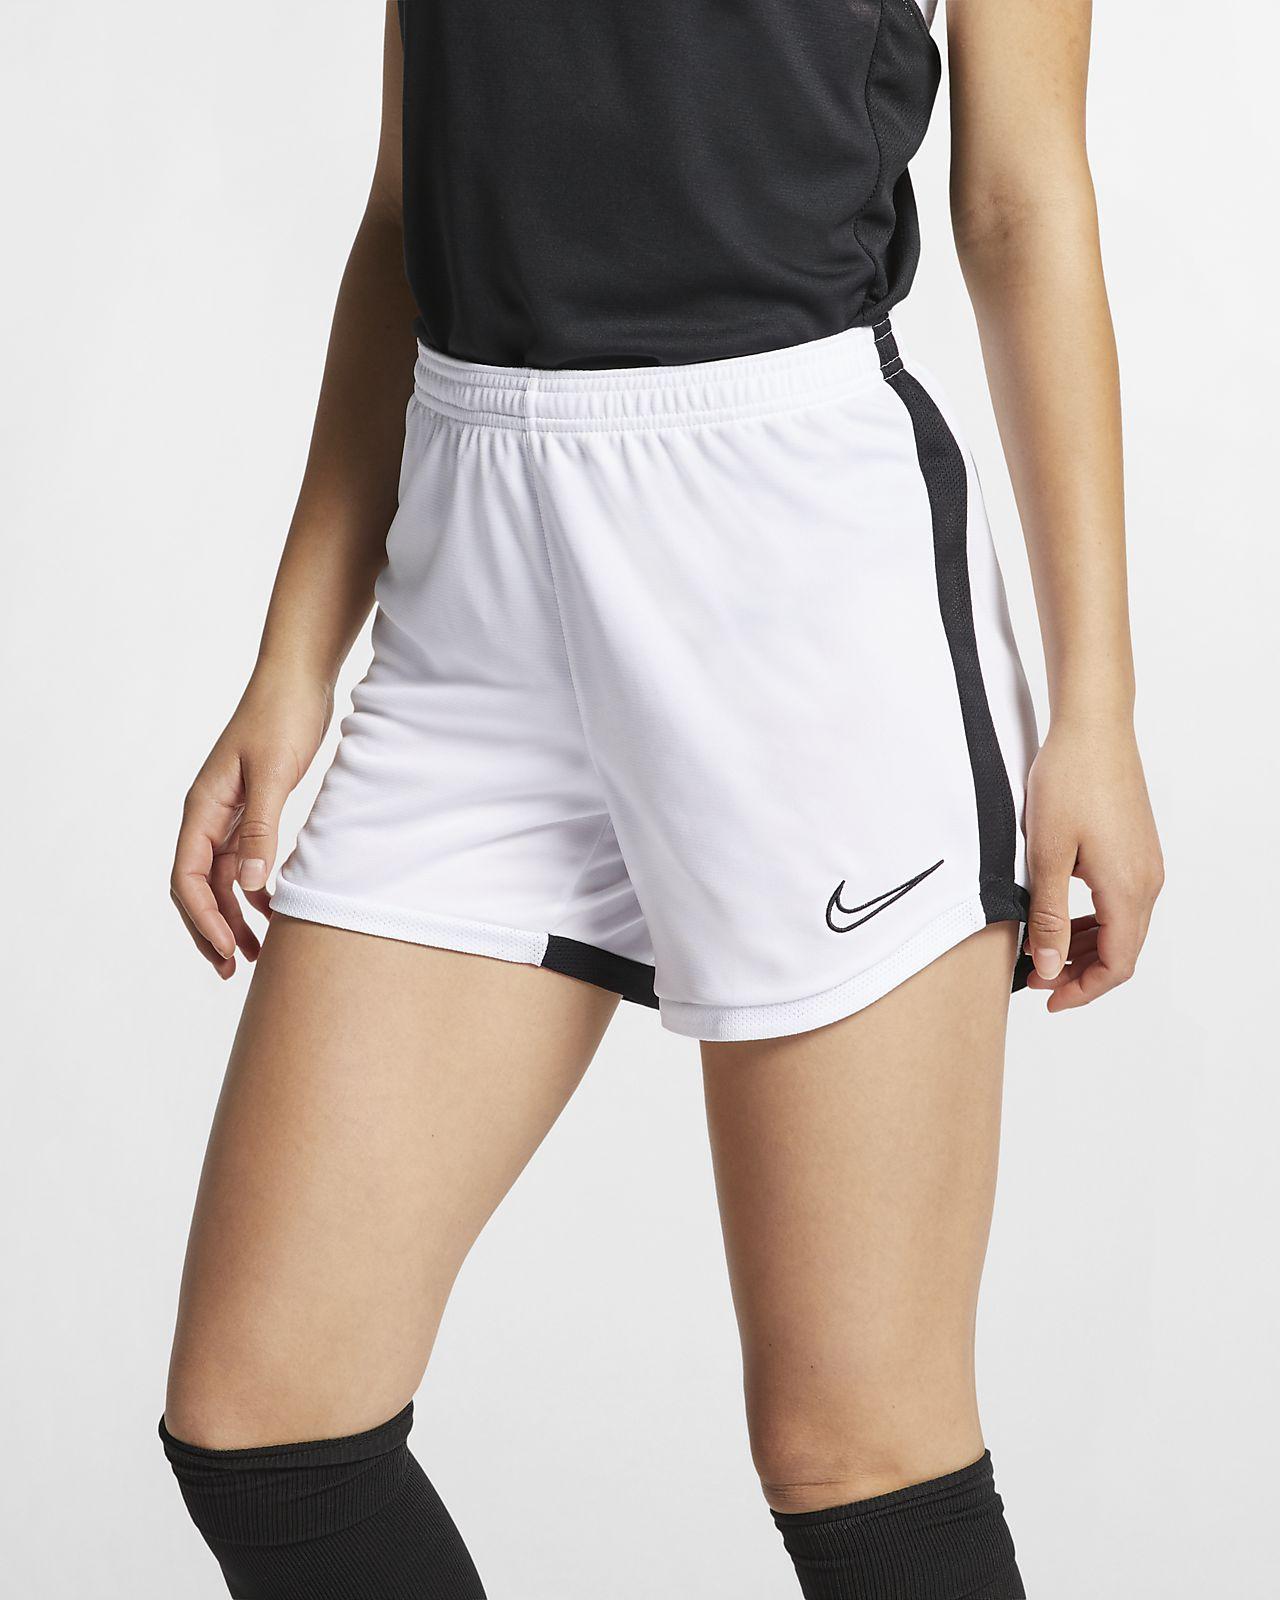 Nike Dri-FIT Academy női futballrövidnadrág